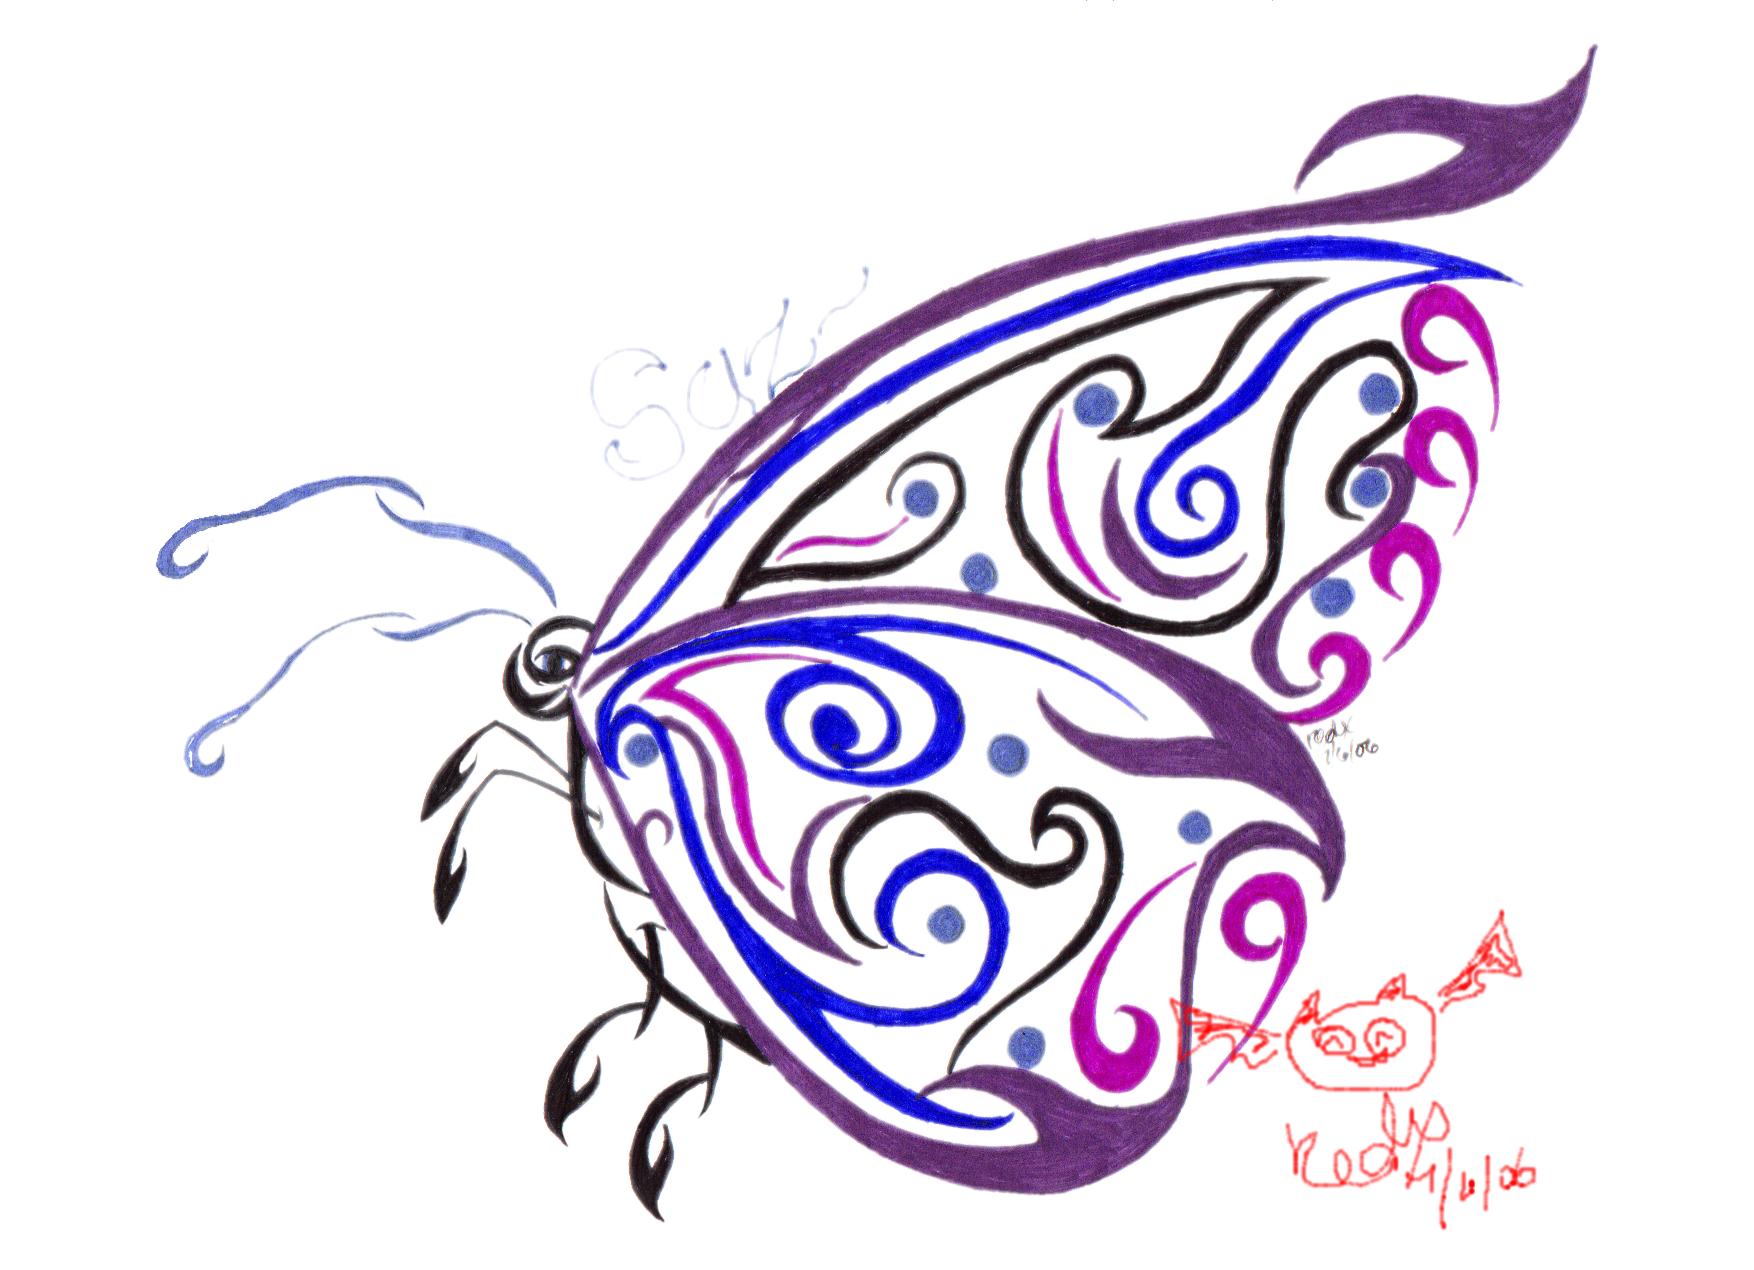 Tribal freedom by xgealicdraganx on deviantart for Freedom tribal tattoos